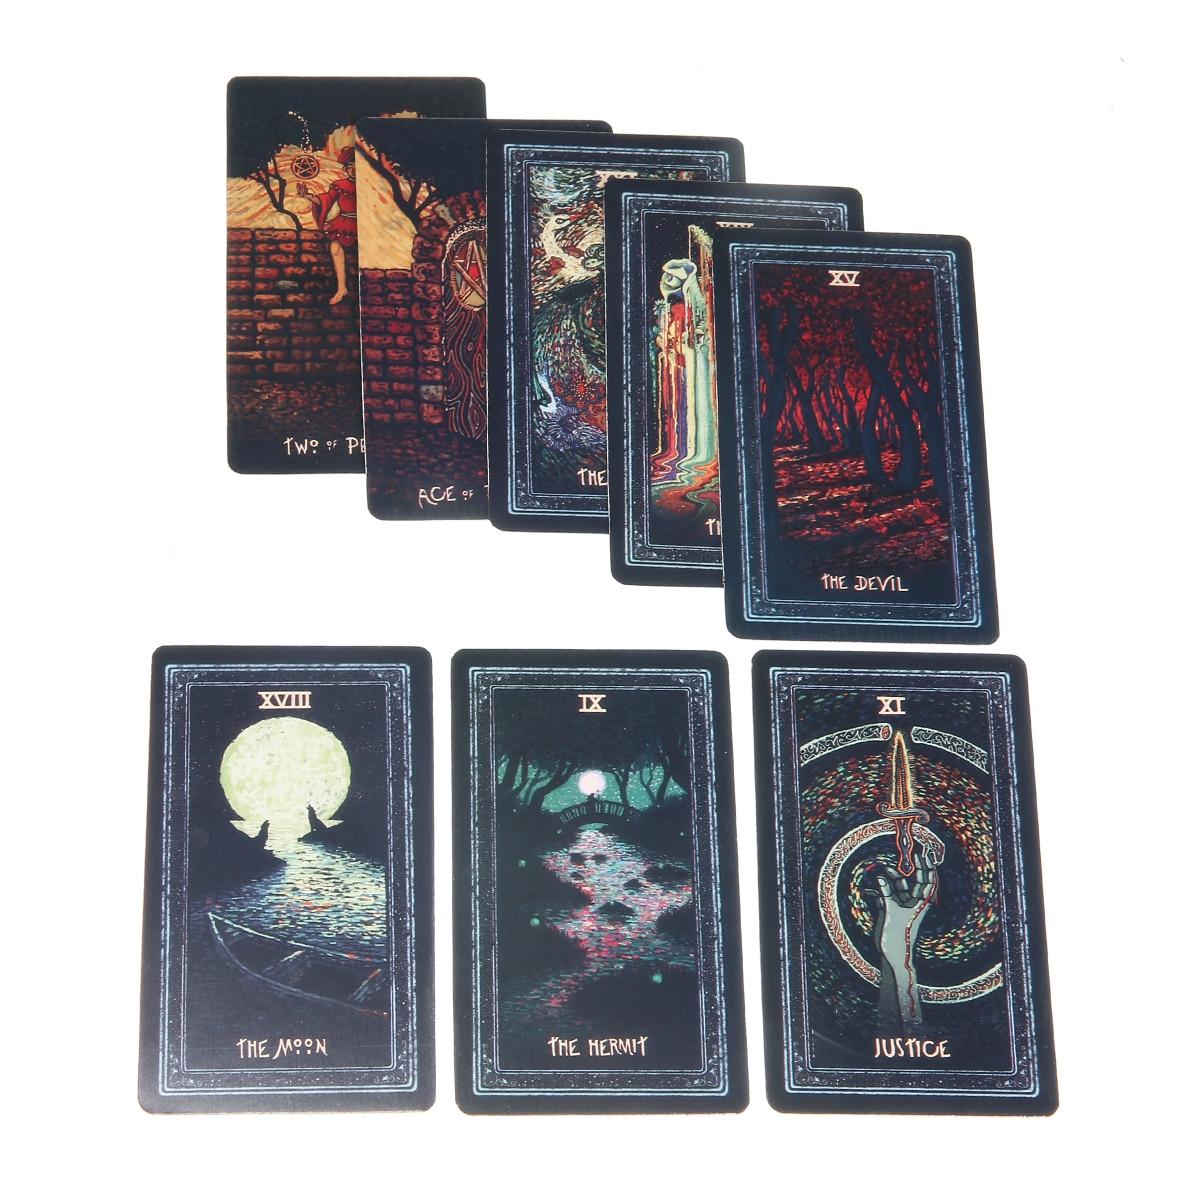 2019 Full English Deck Tarot Cards DIY Silver Plating Prisma Visions Tarot High Quality Tarot Deck Board Game Cards